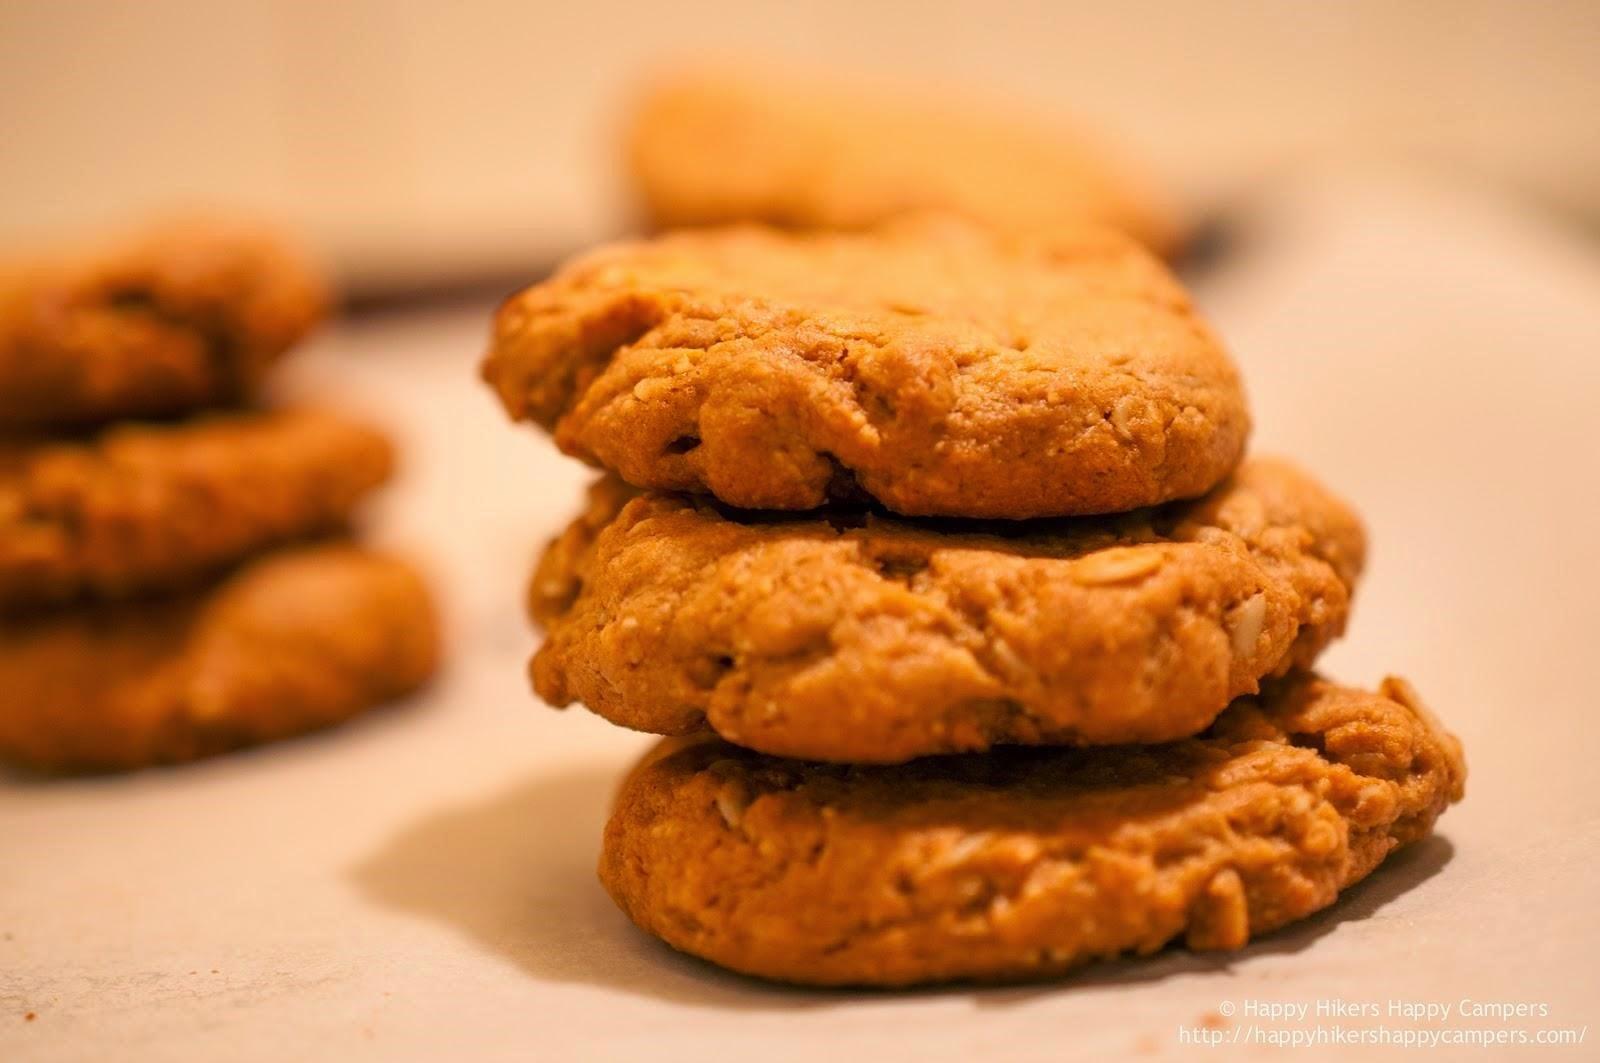 Polka Dot Peanut Butter Oatmeal Cookies (Gluten Free)